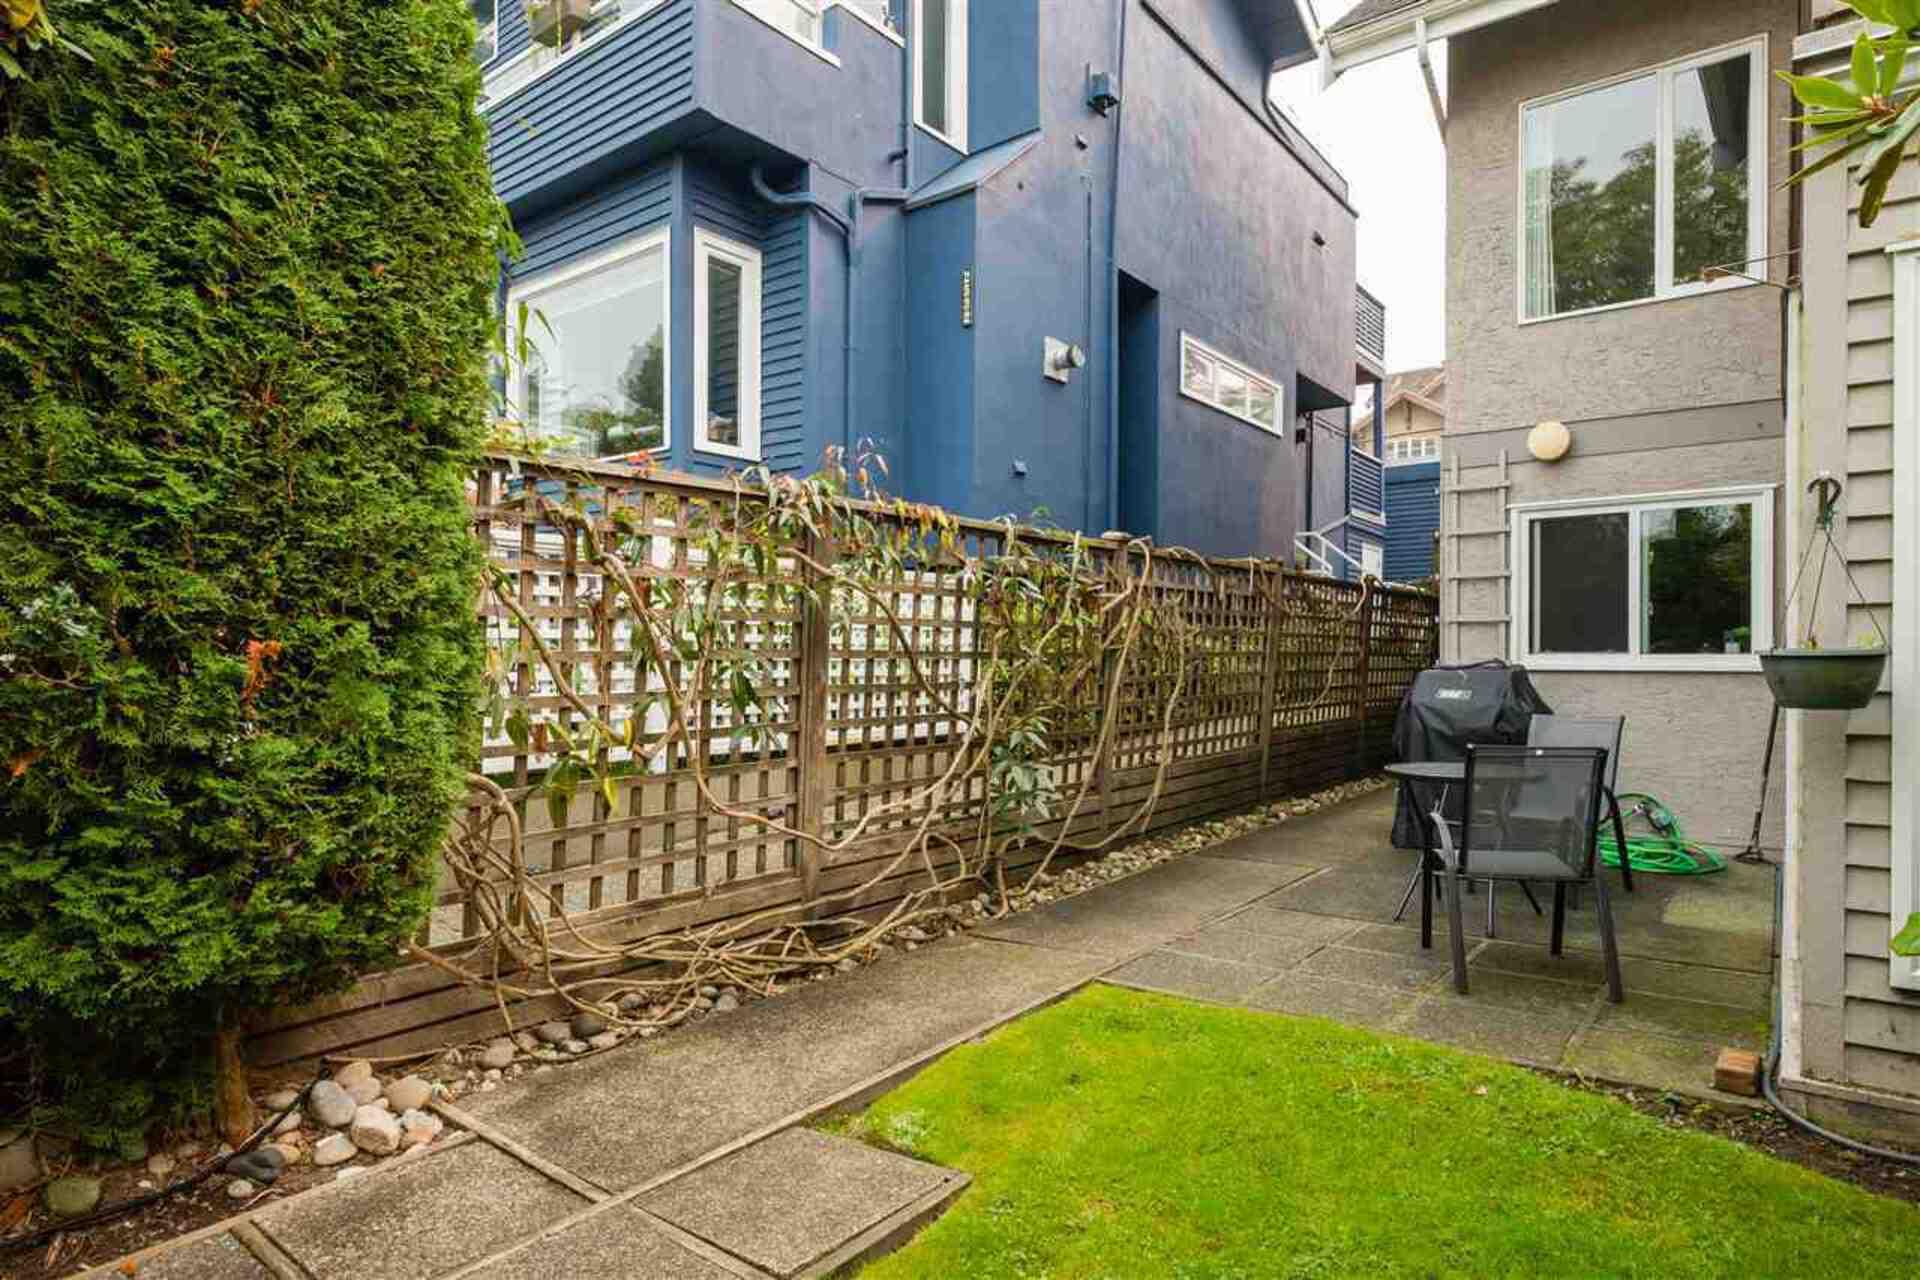 2536-cornwall-avenue-kitsilano-vancouver-west-21 at 2536 Cornwall Avenue, Kitsilano, Vancouver West